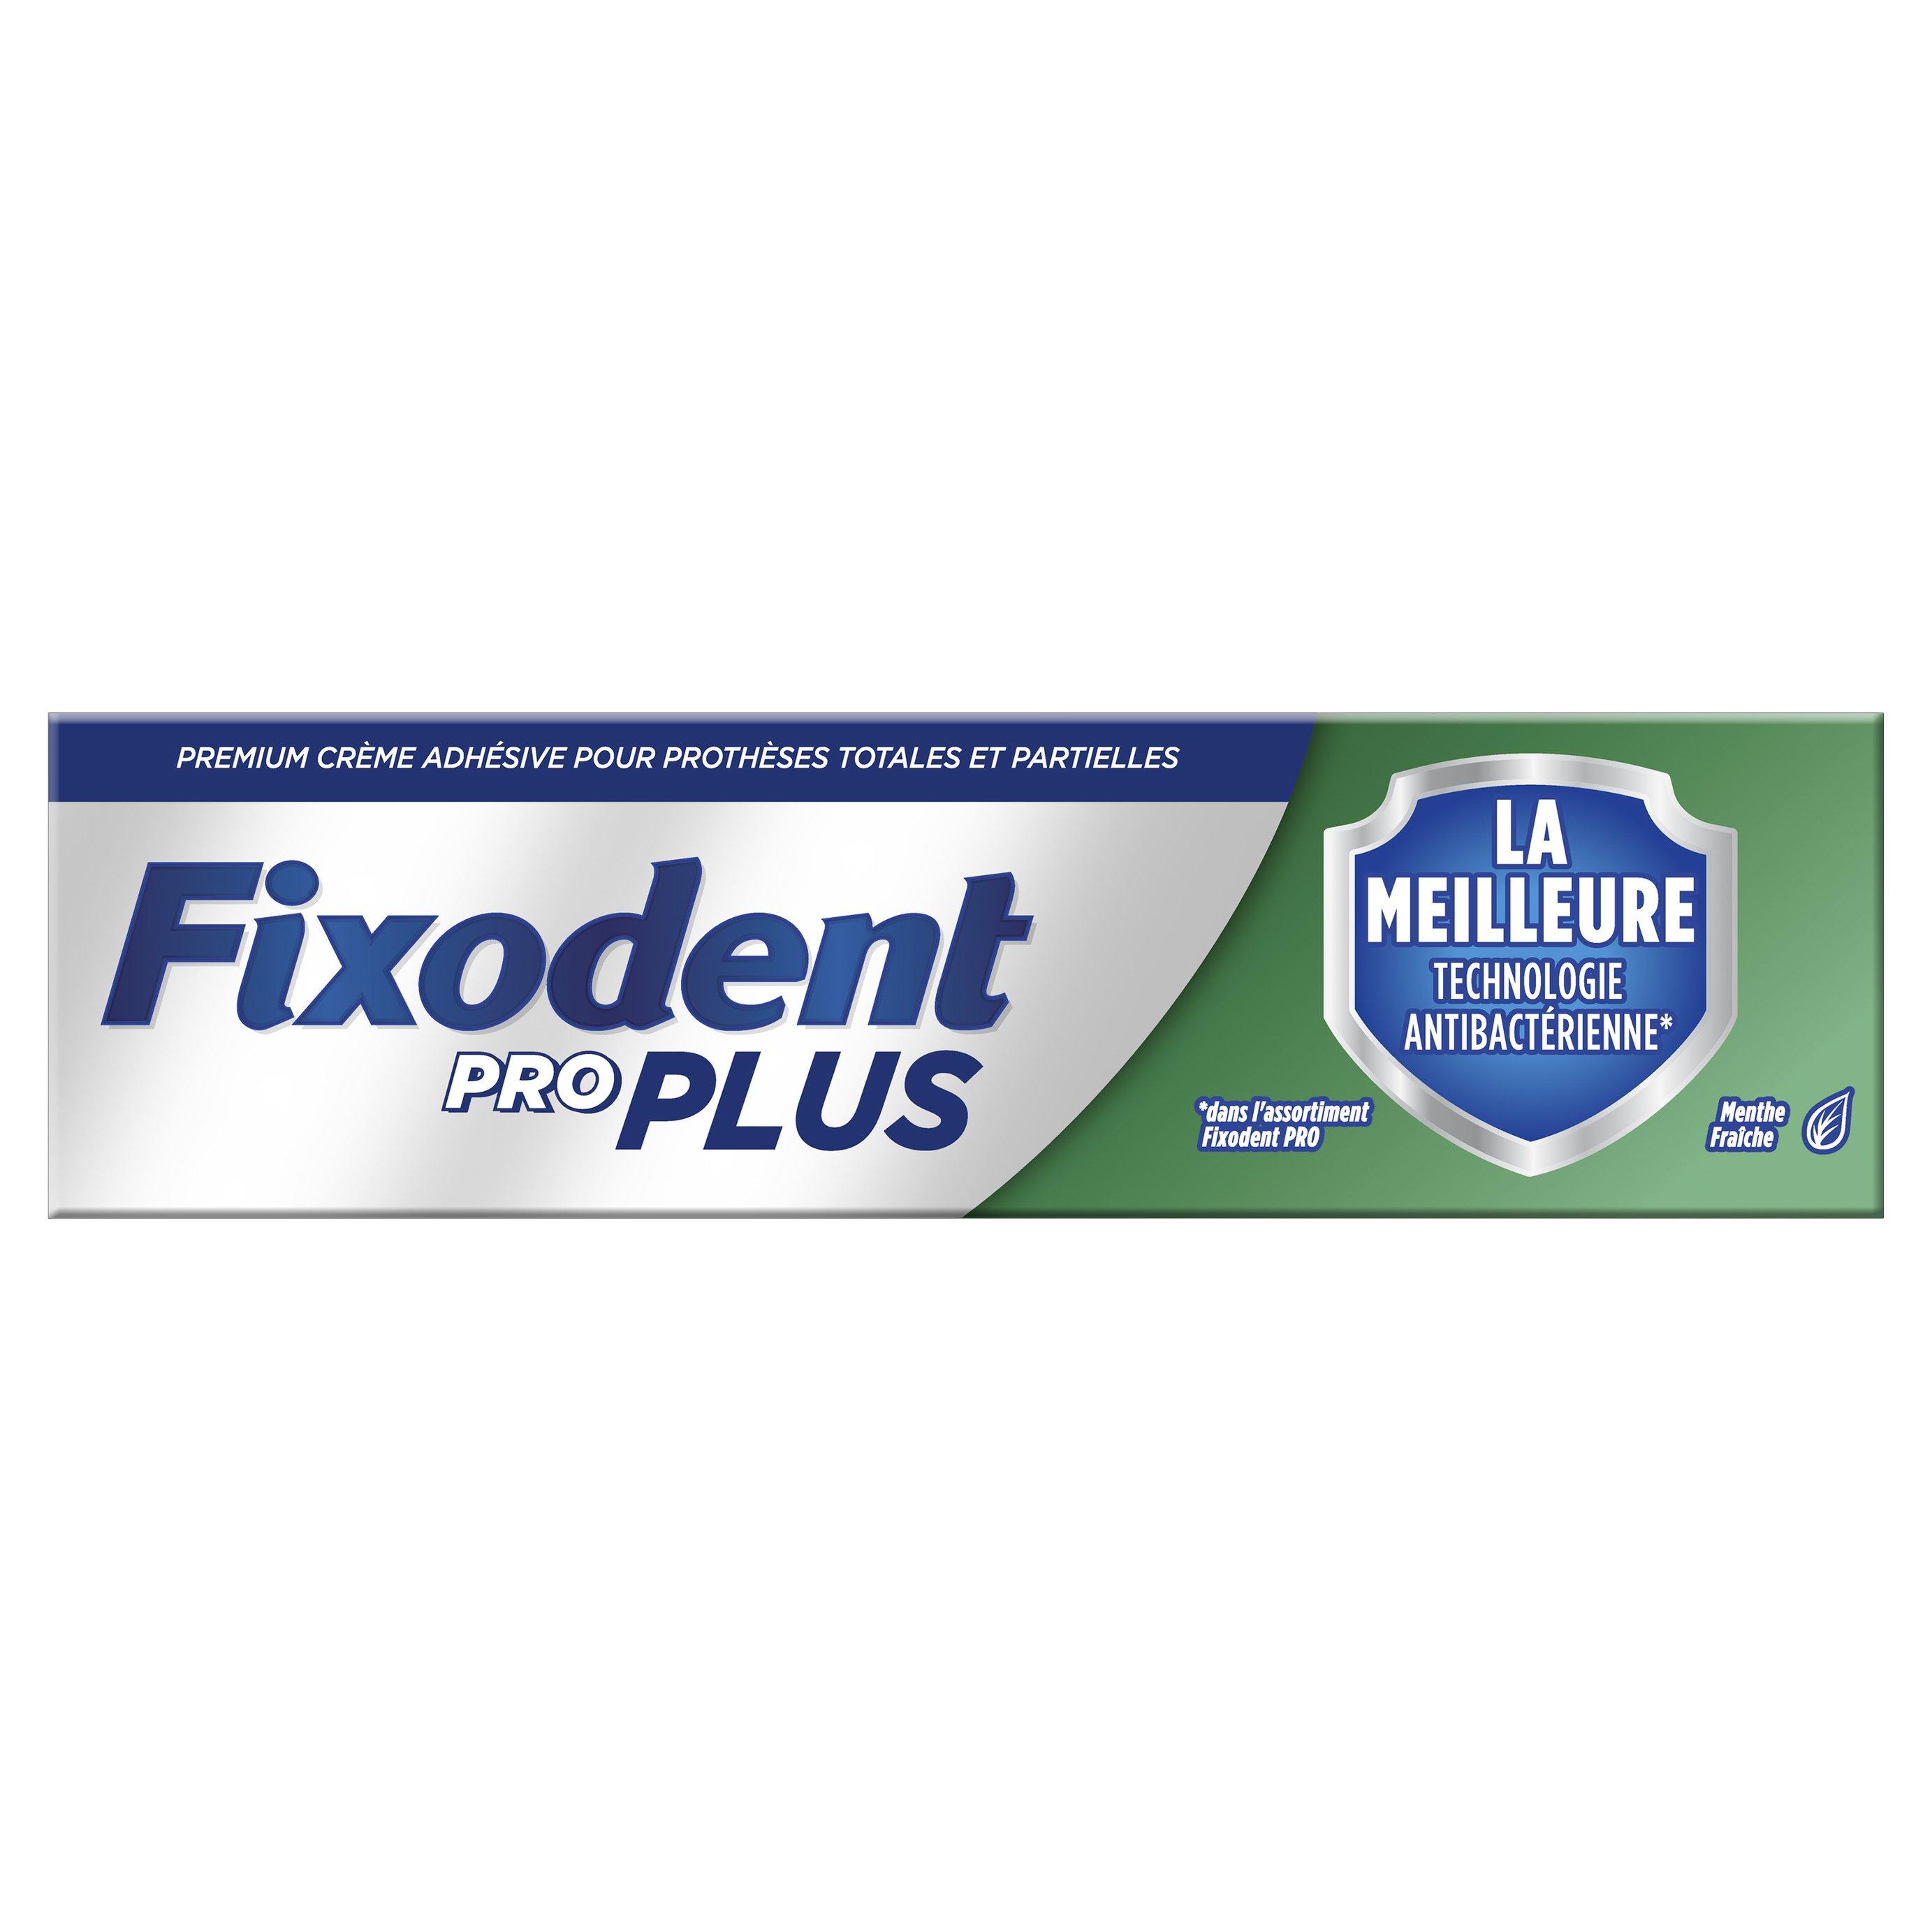 Fixodent Dual Protection Pro Plus Στερεωτική Κρέμα για Τεχνητή Οδοντοστοιχία 40g